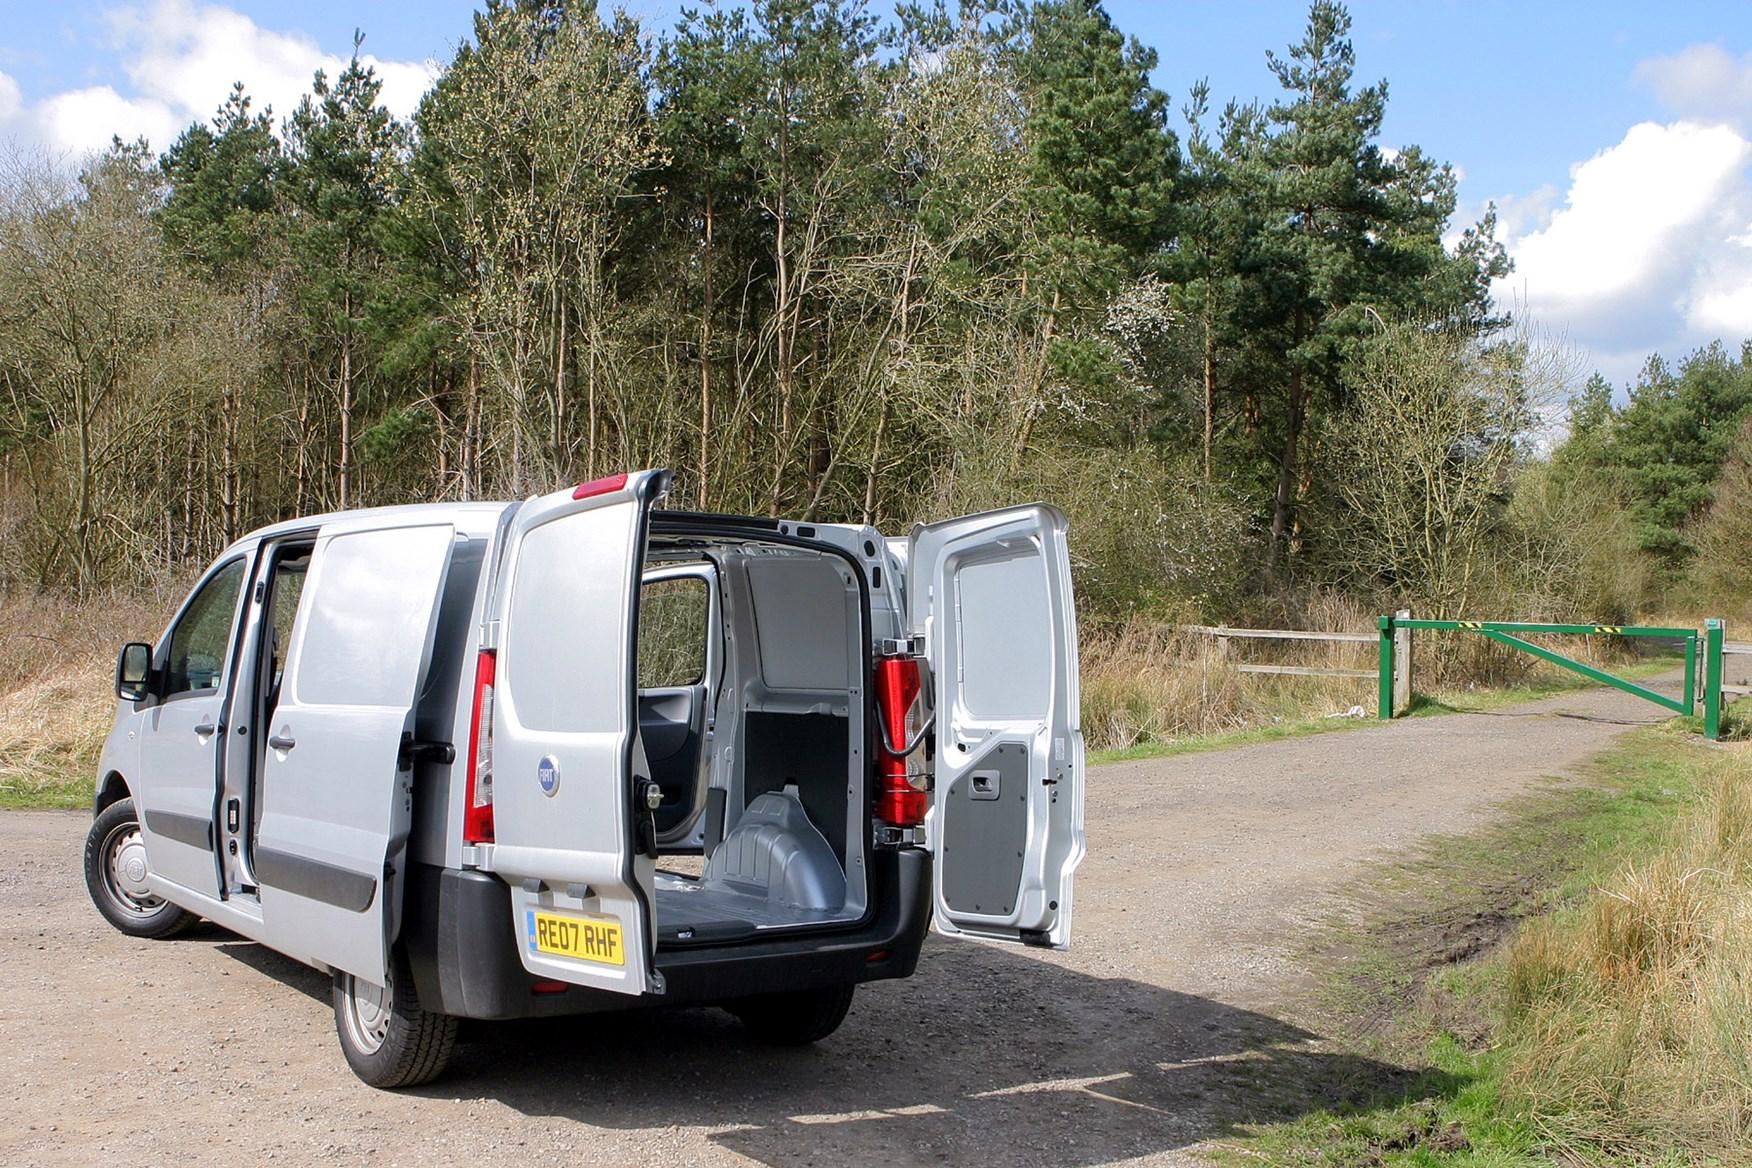 Fiat Scudo 2007-2016 review on Parkers Vans - load area access